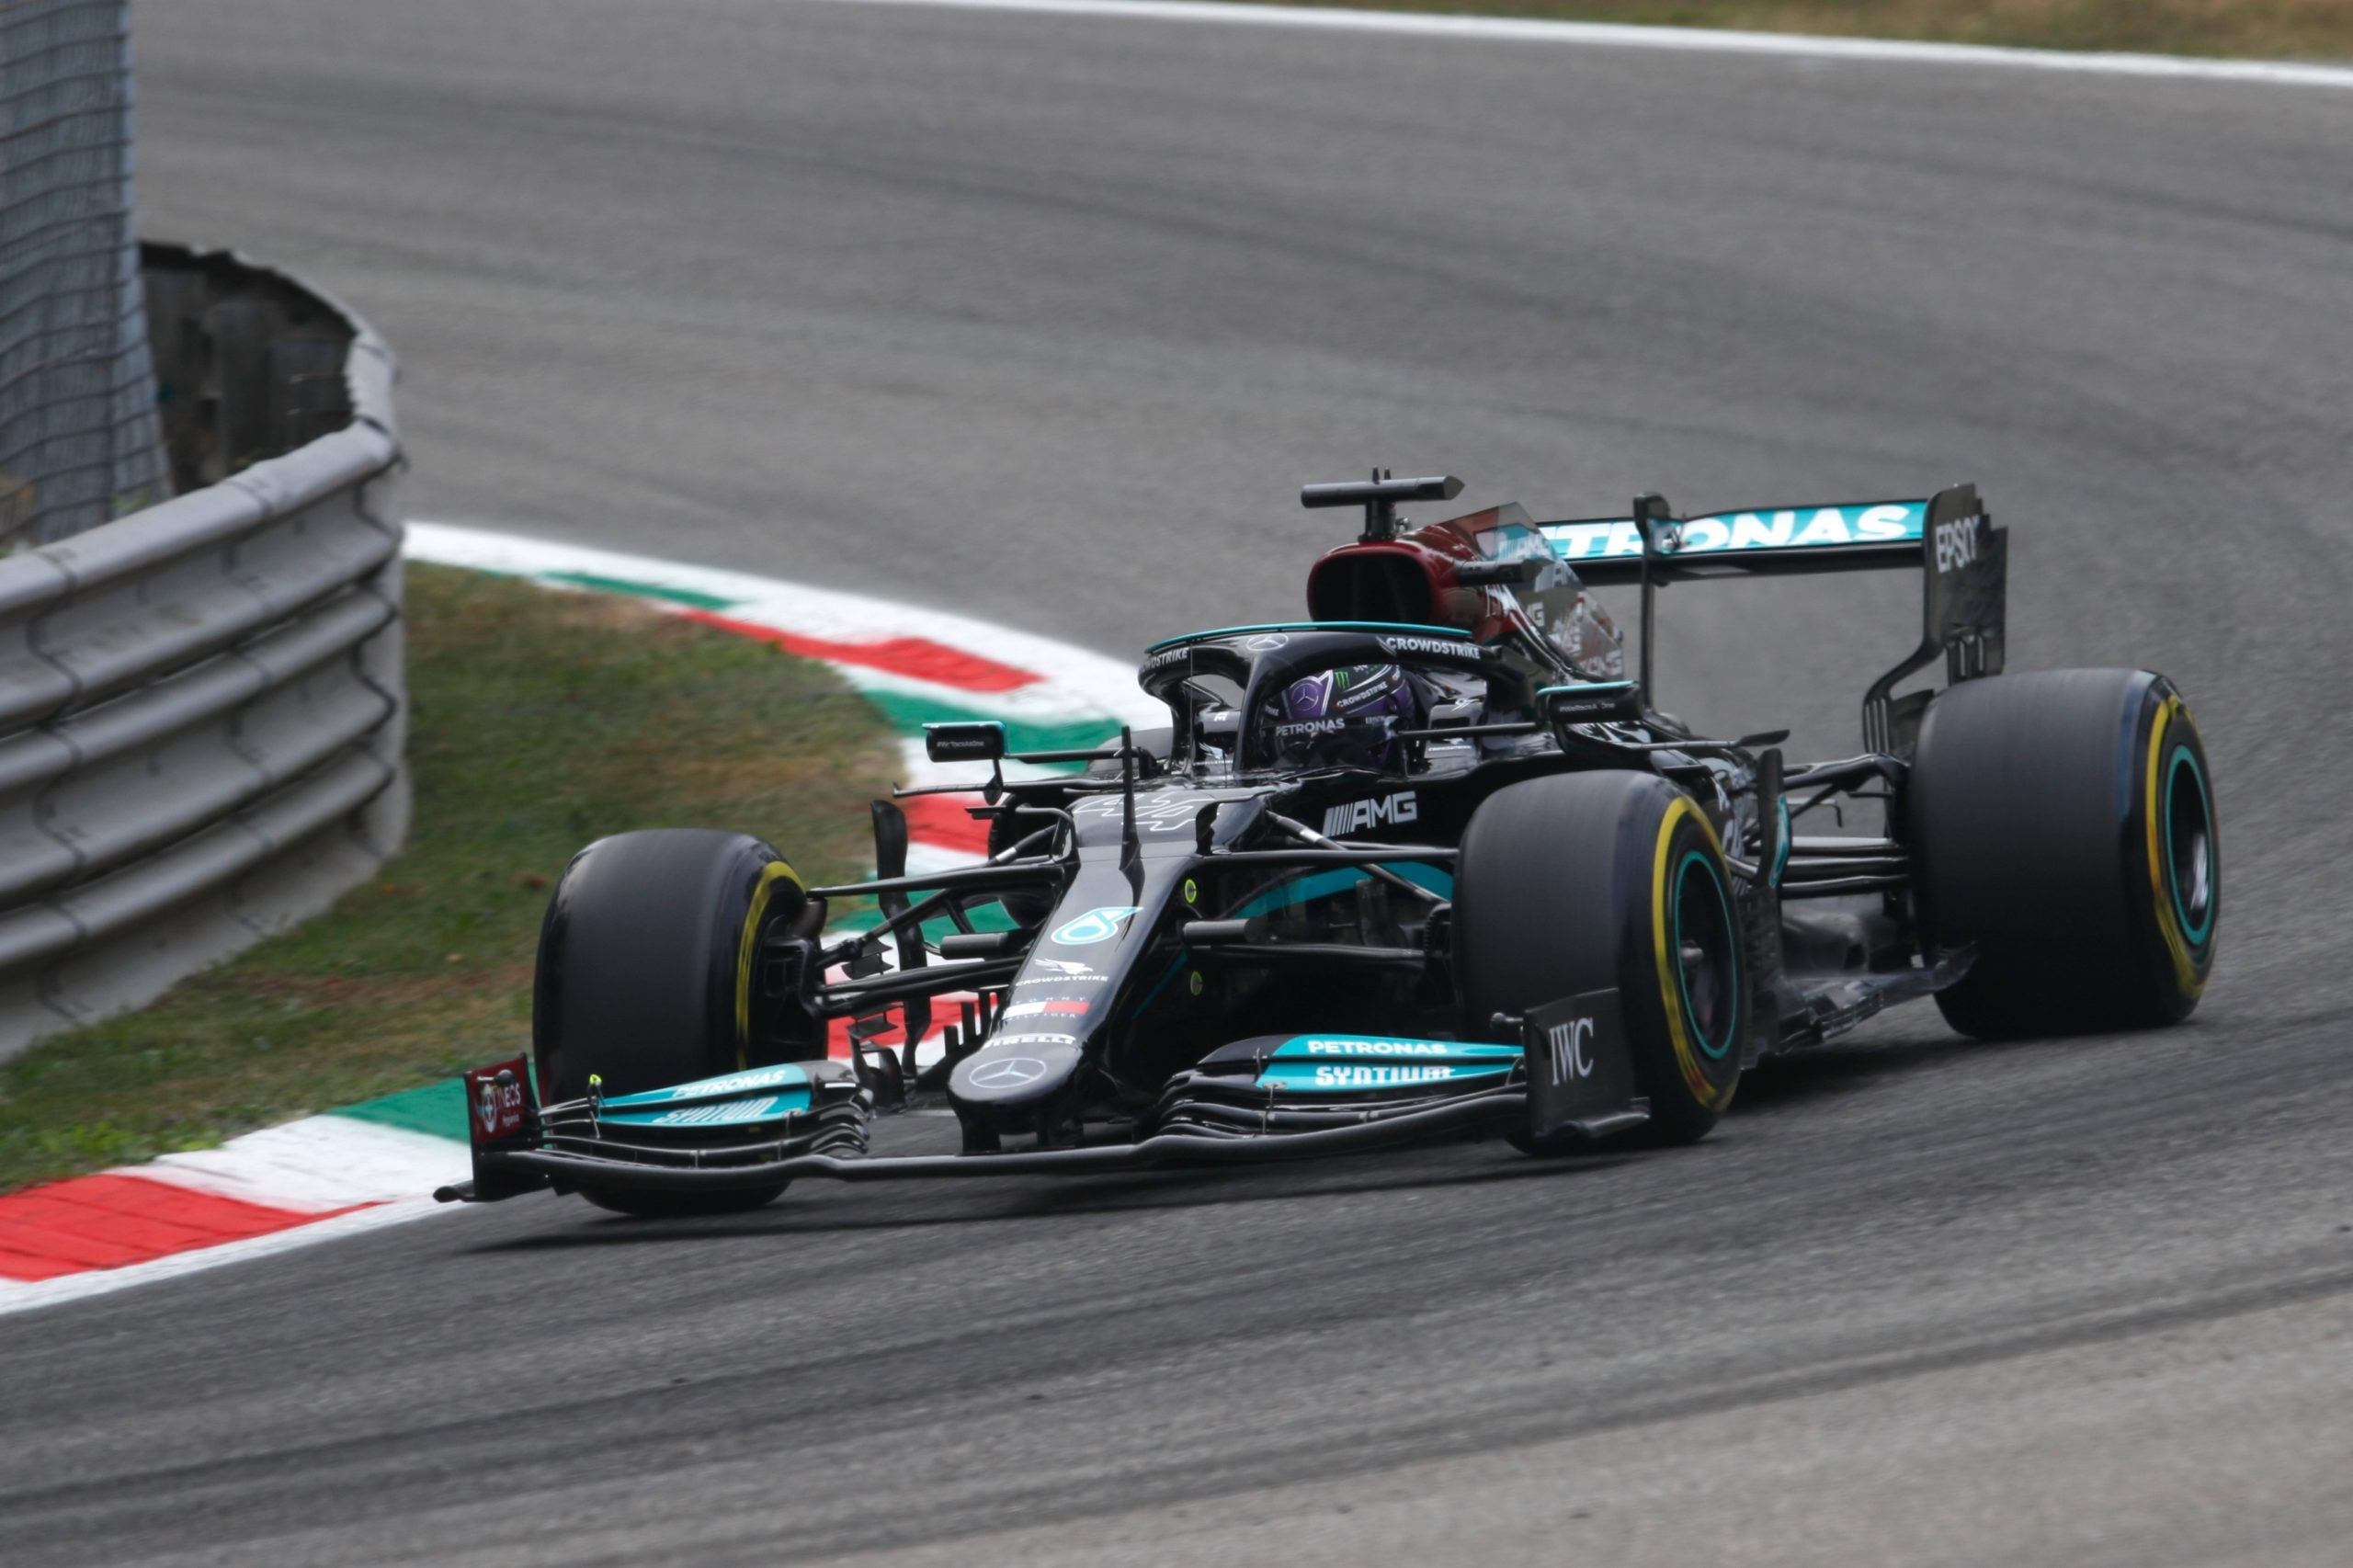 Lewis Hamilton, F1, Italian GP